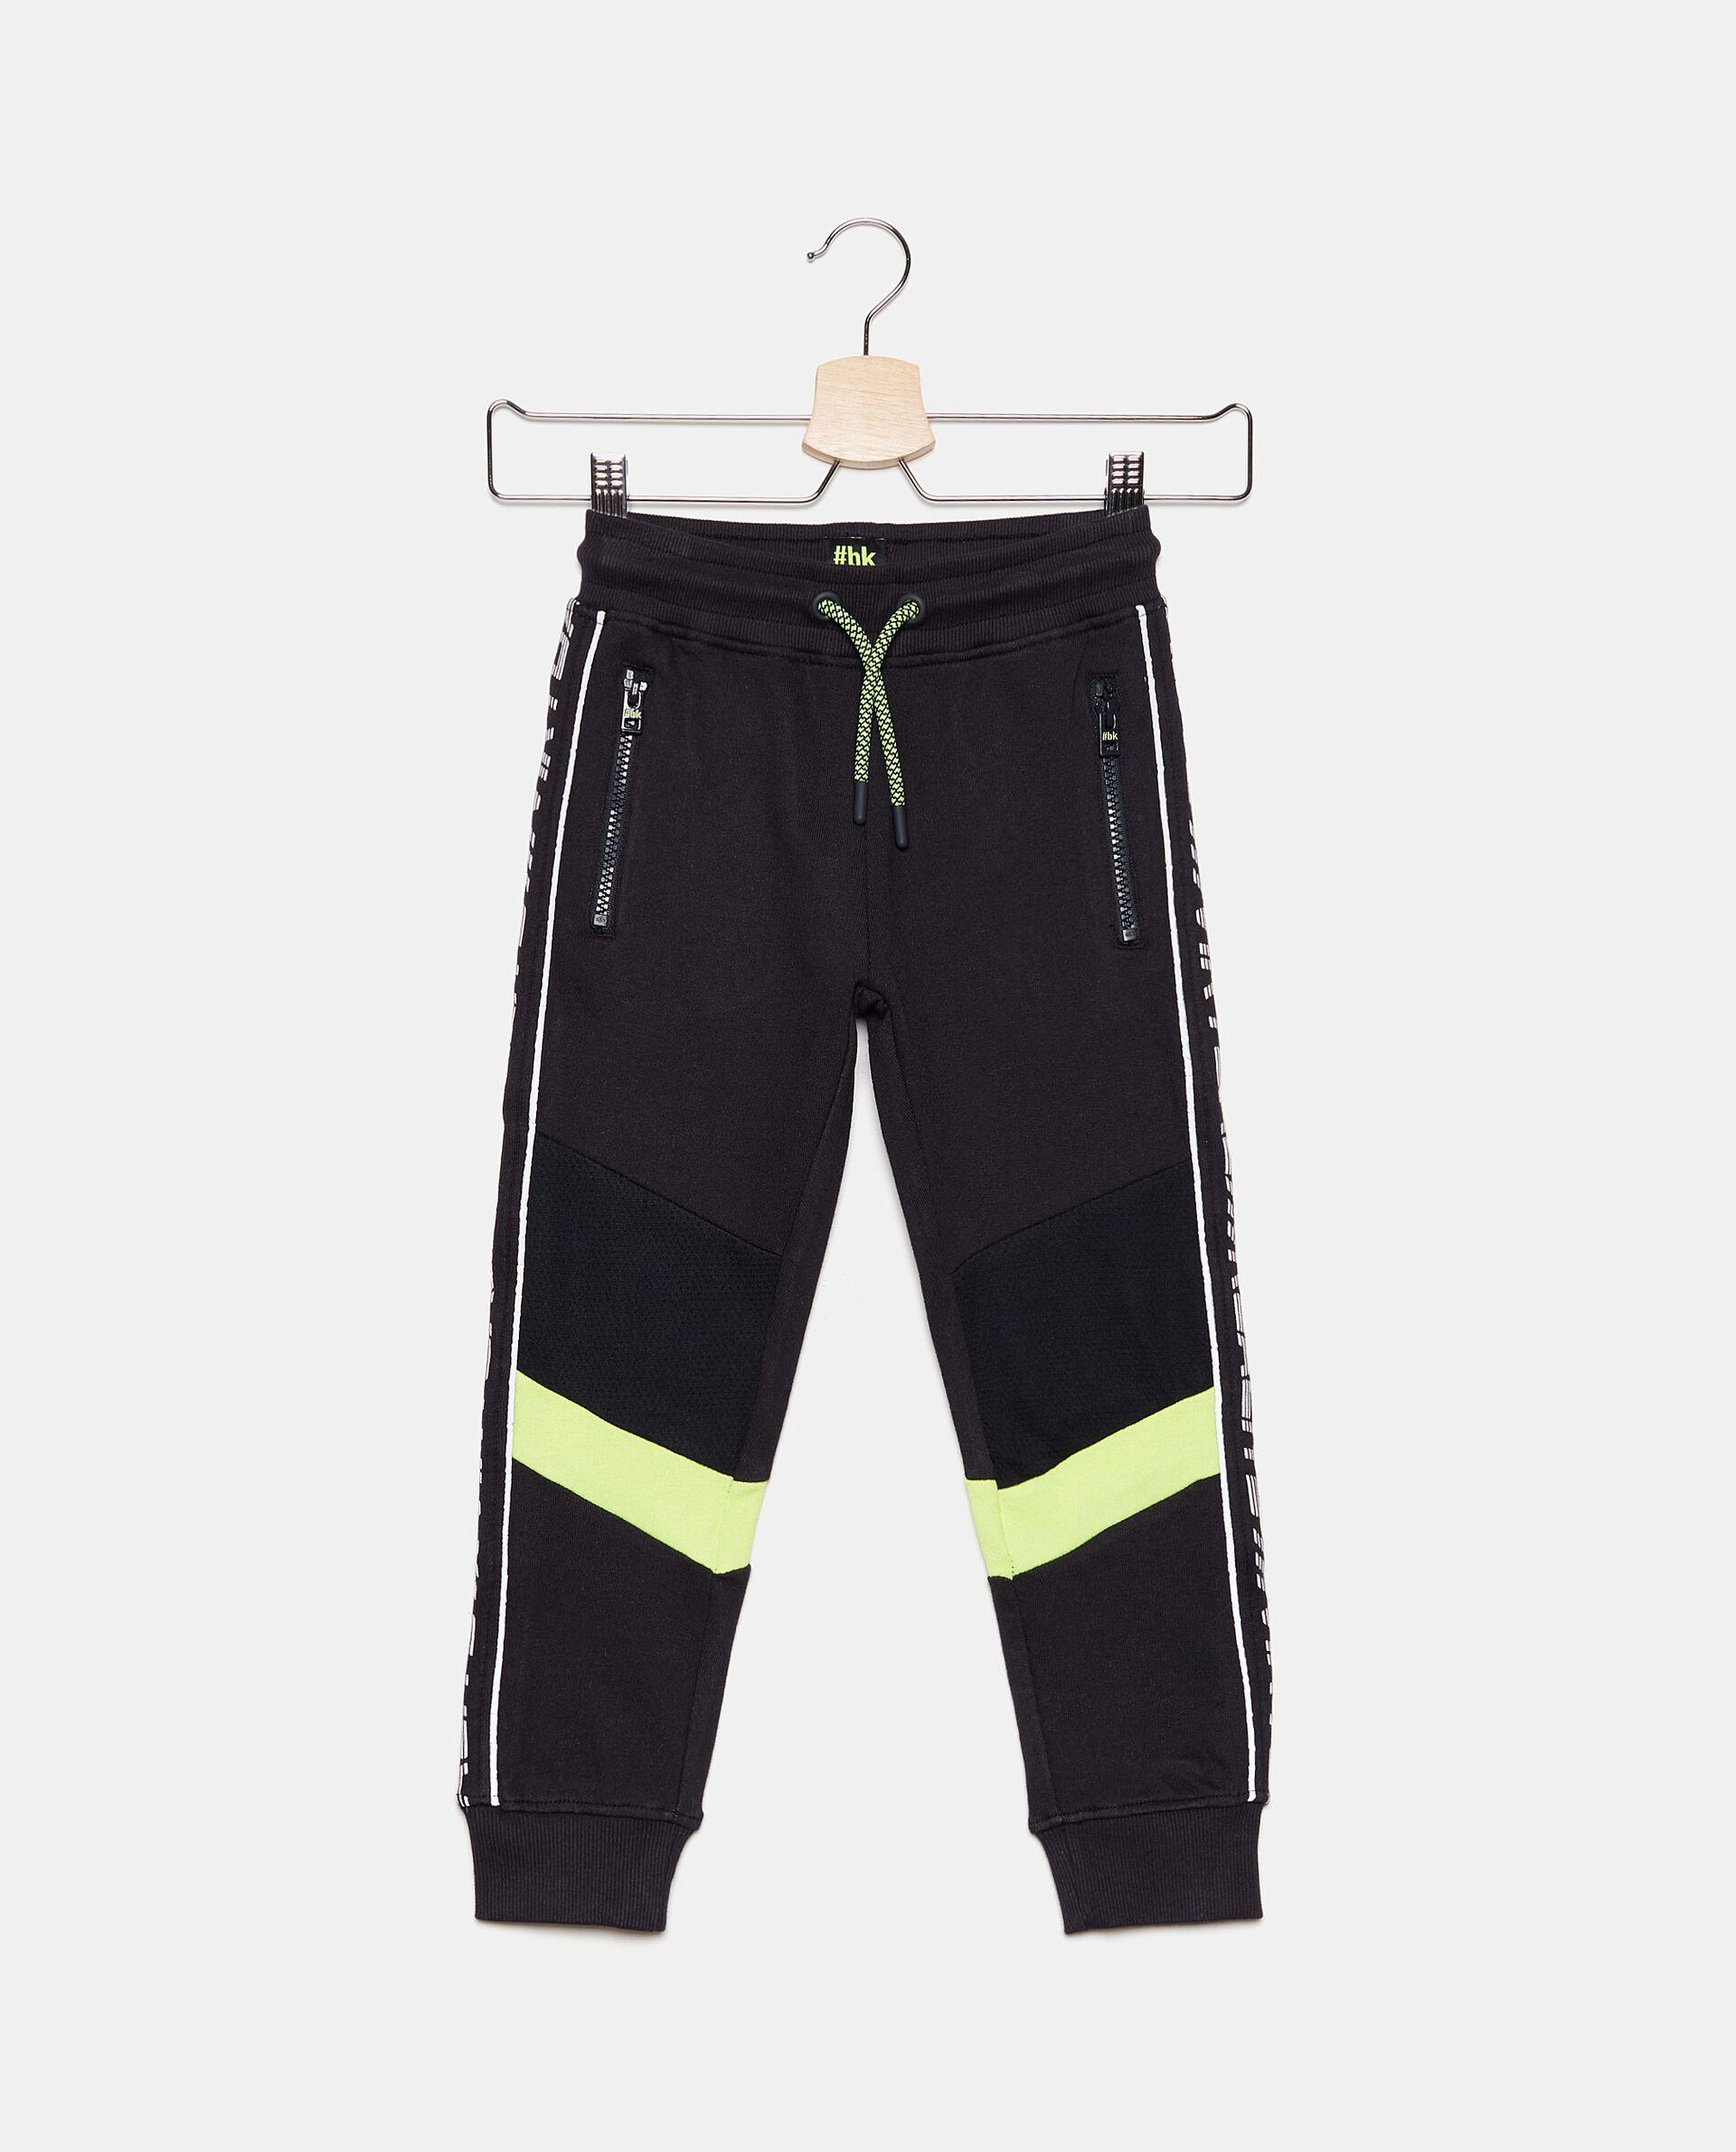 Pantaloni in cotone con bande bambino